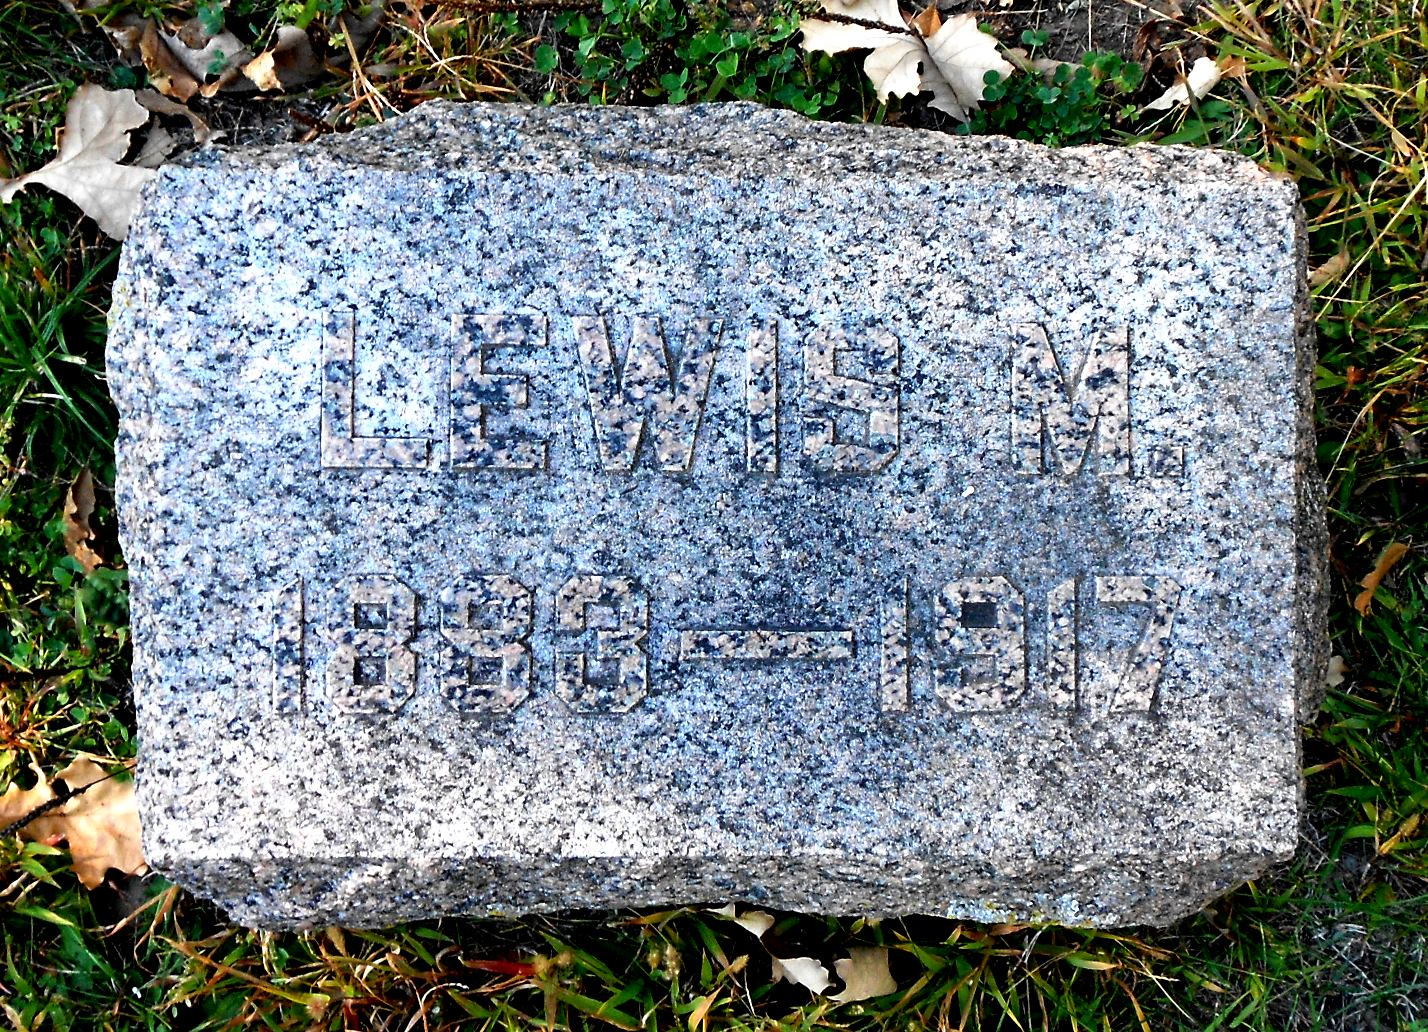 Lewis Martin Dawes